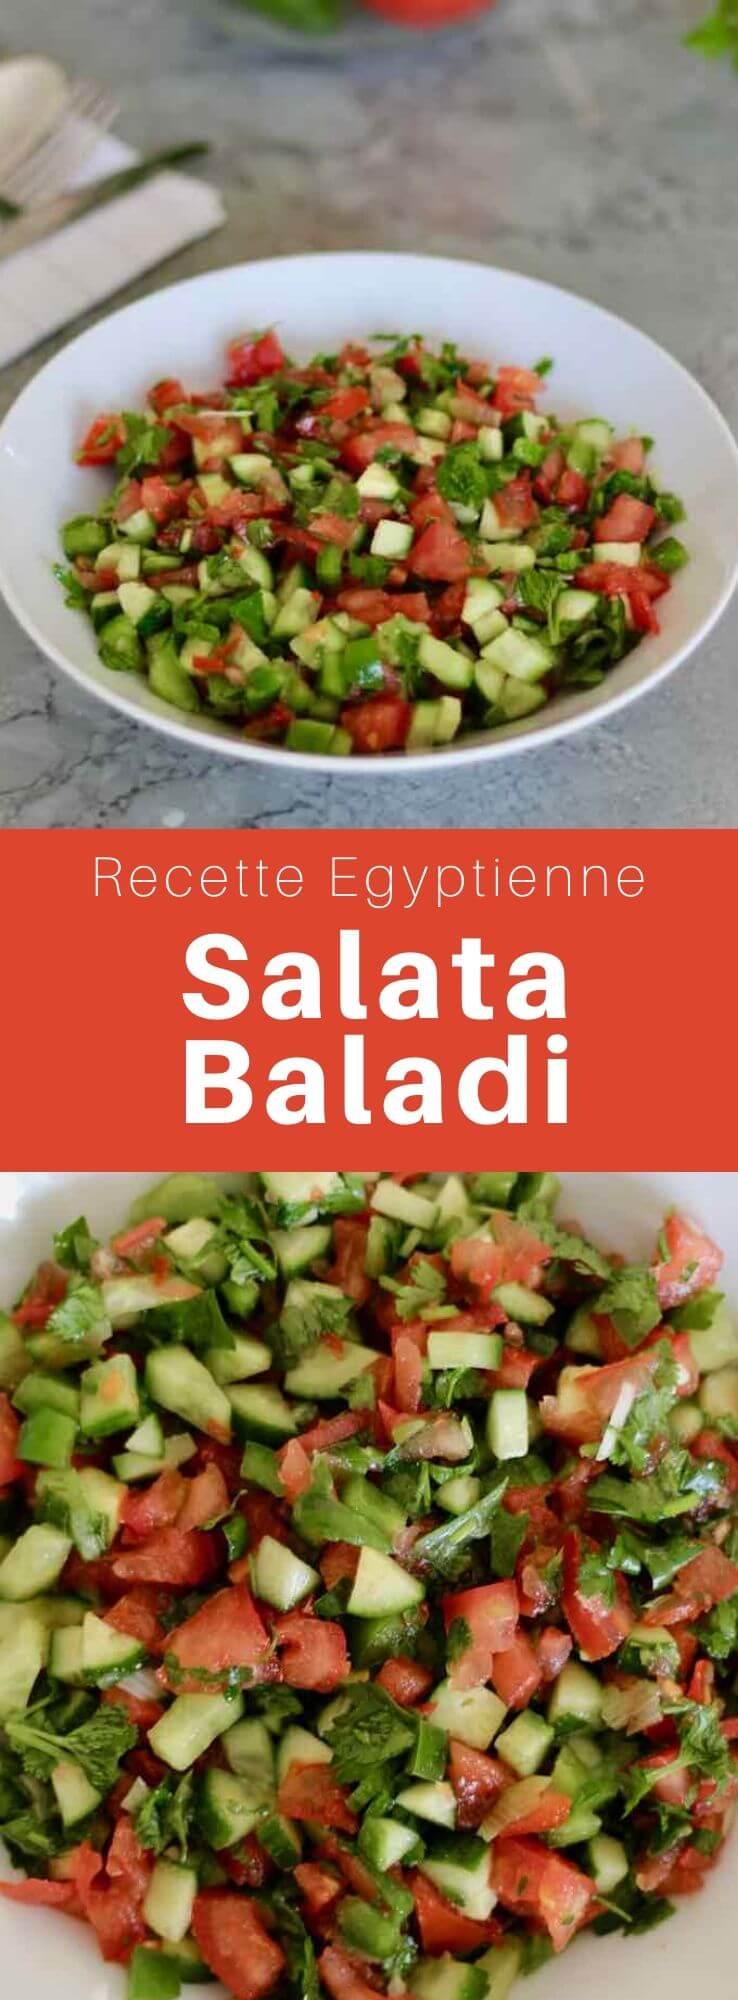 La salata baladi (سلطة البلدي), ou salata arbya (سلطة عربية) est une salade arabe de crudités populaire en Égypte, au Moyen-Orient et en Afrique du Nord. #Egypte #RecetteEgyptienne #CuisineEgyptienne #CuisineDuMonde #196flavors